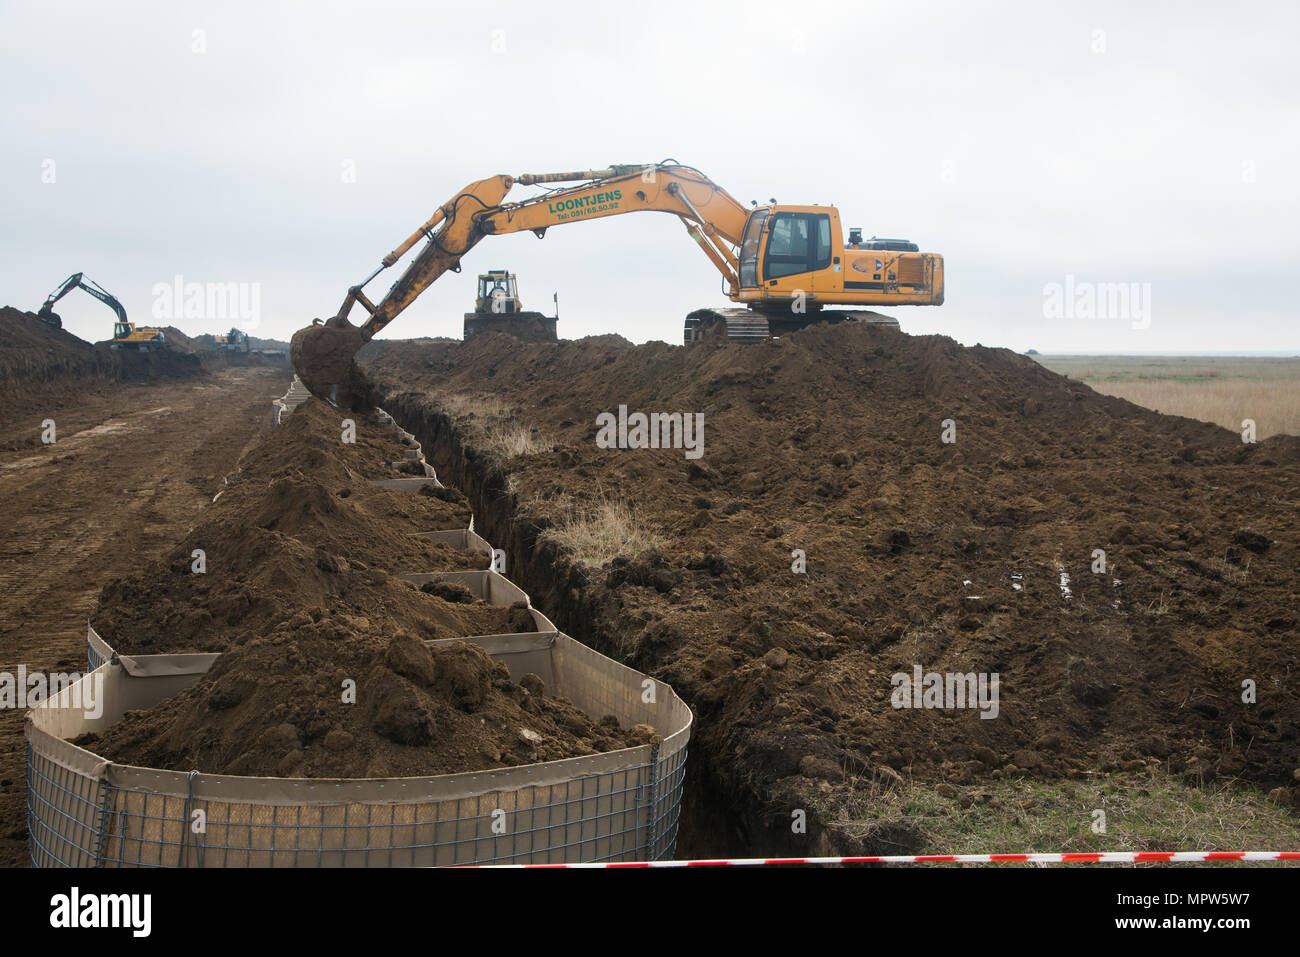 Army Excavator Stockfotos & Army Excavator Bilder - Seite 3 - Alamy